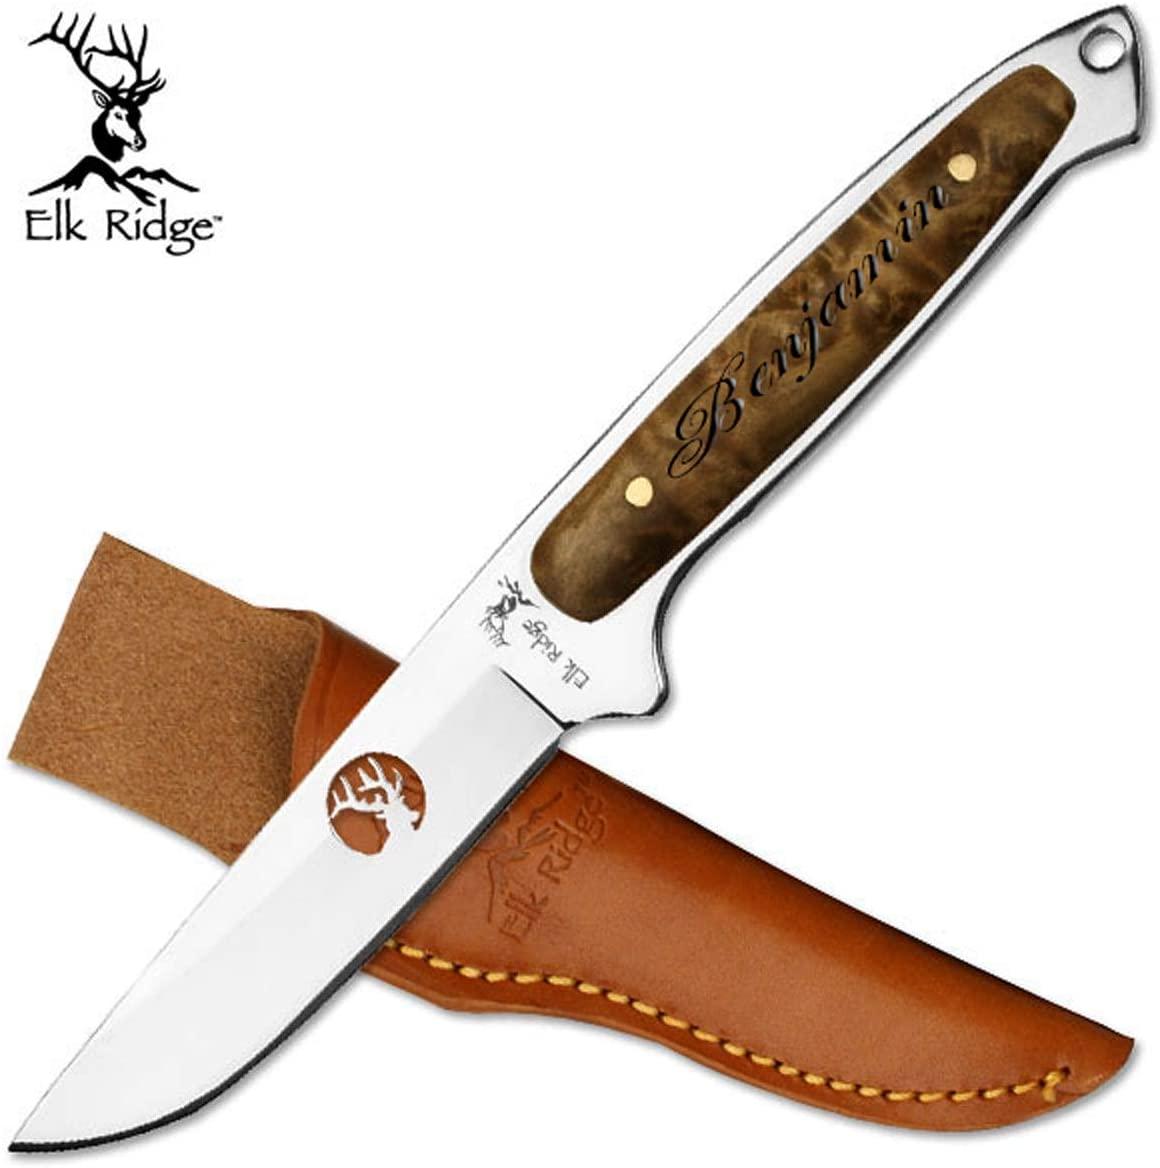 Elk Ridge Free Engraving - Quality Pocket Knife (ER-048)